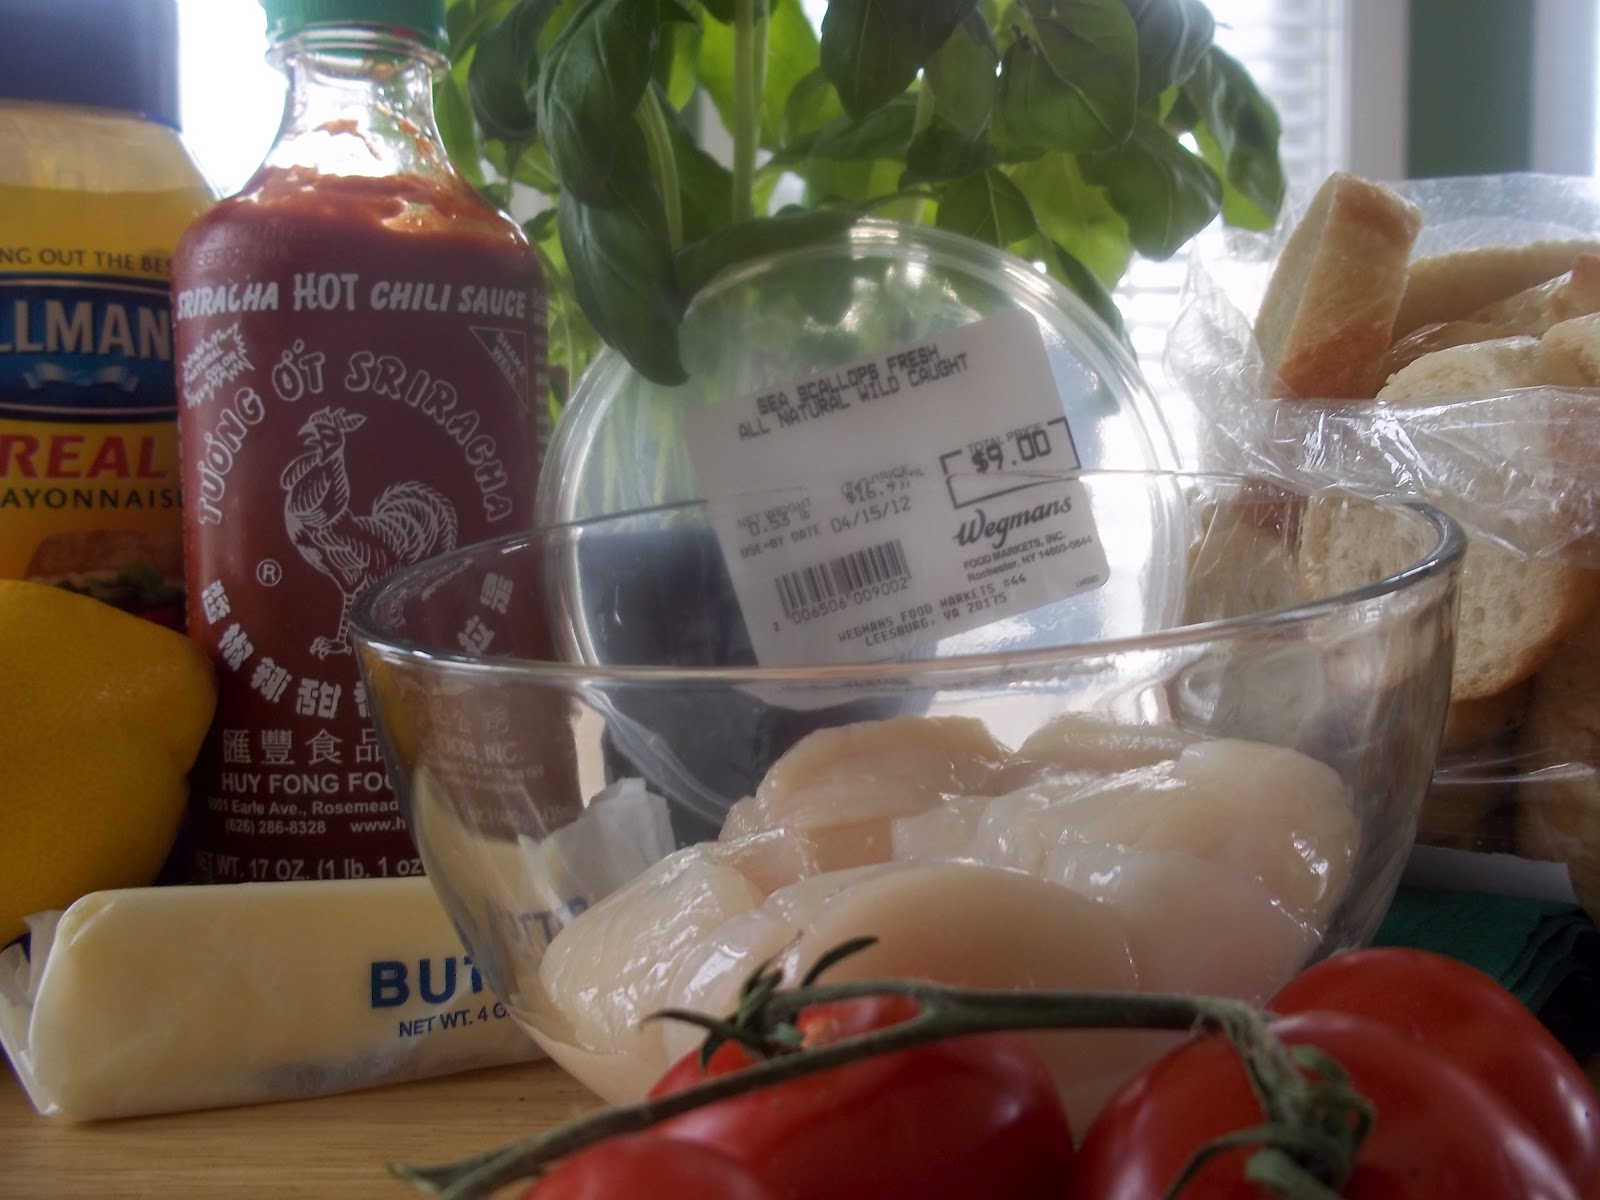 ... basil sea scallop croustini with sriracha chili sauce 8 sea scallops